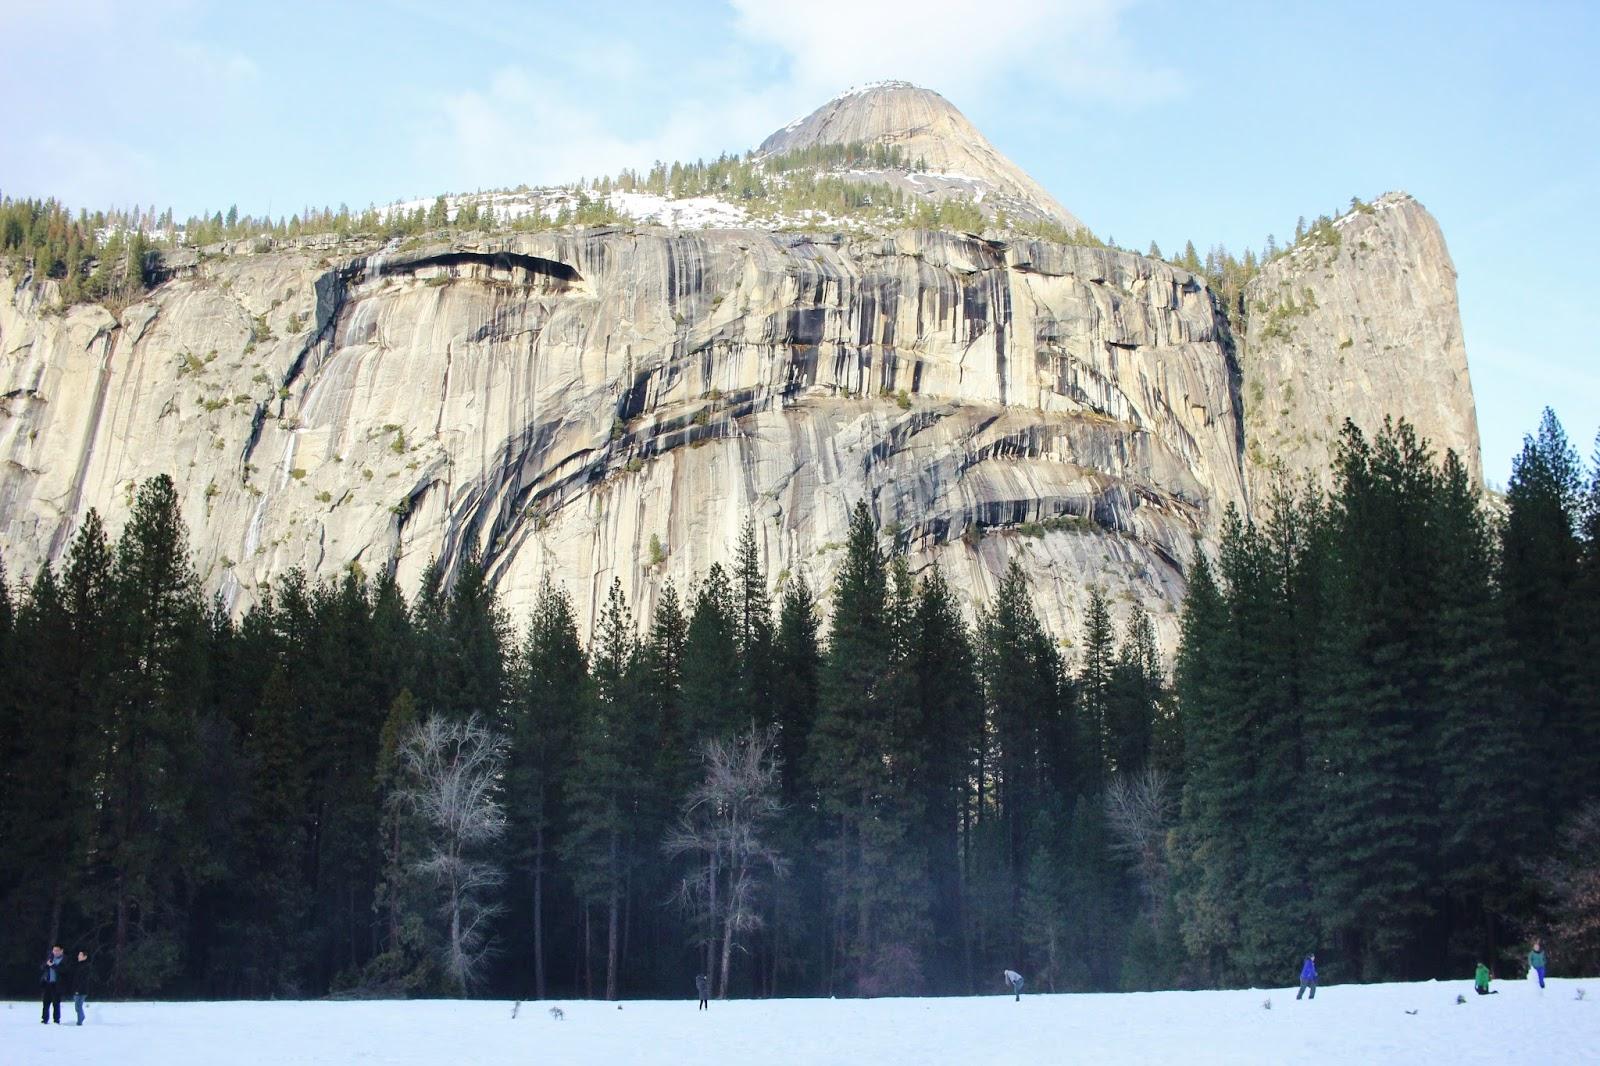 turismo en Yosemite park